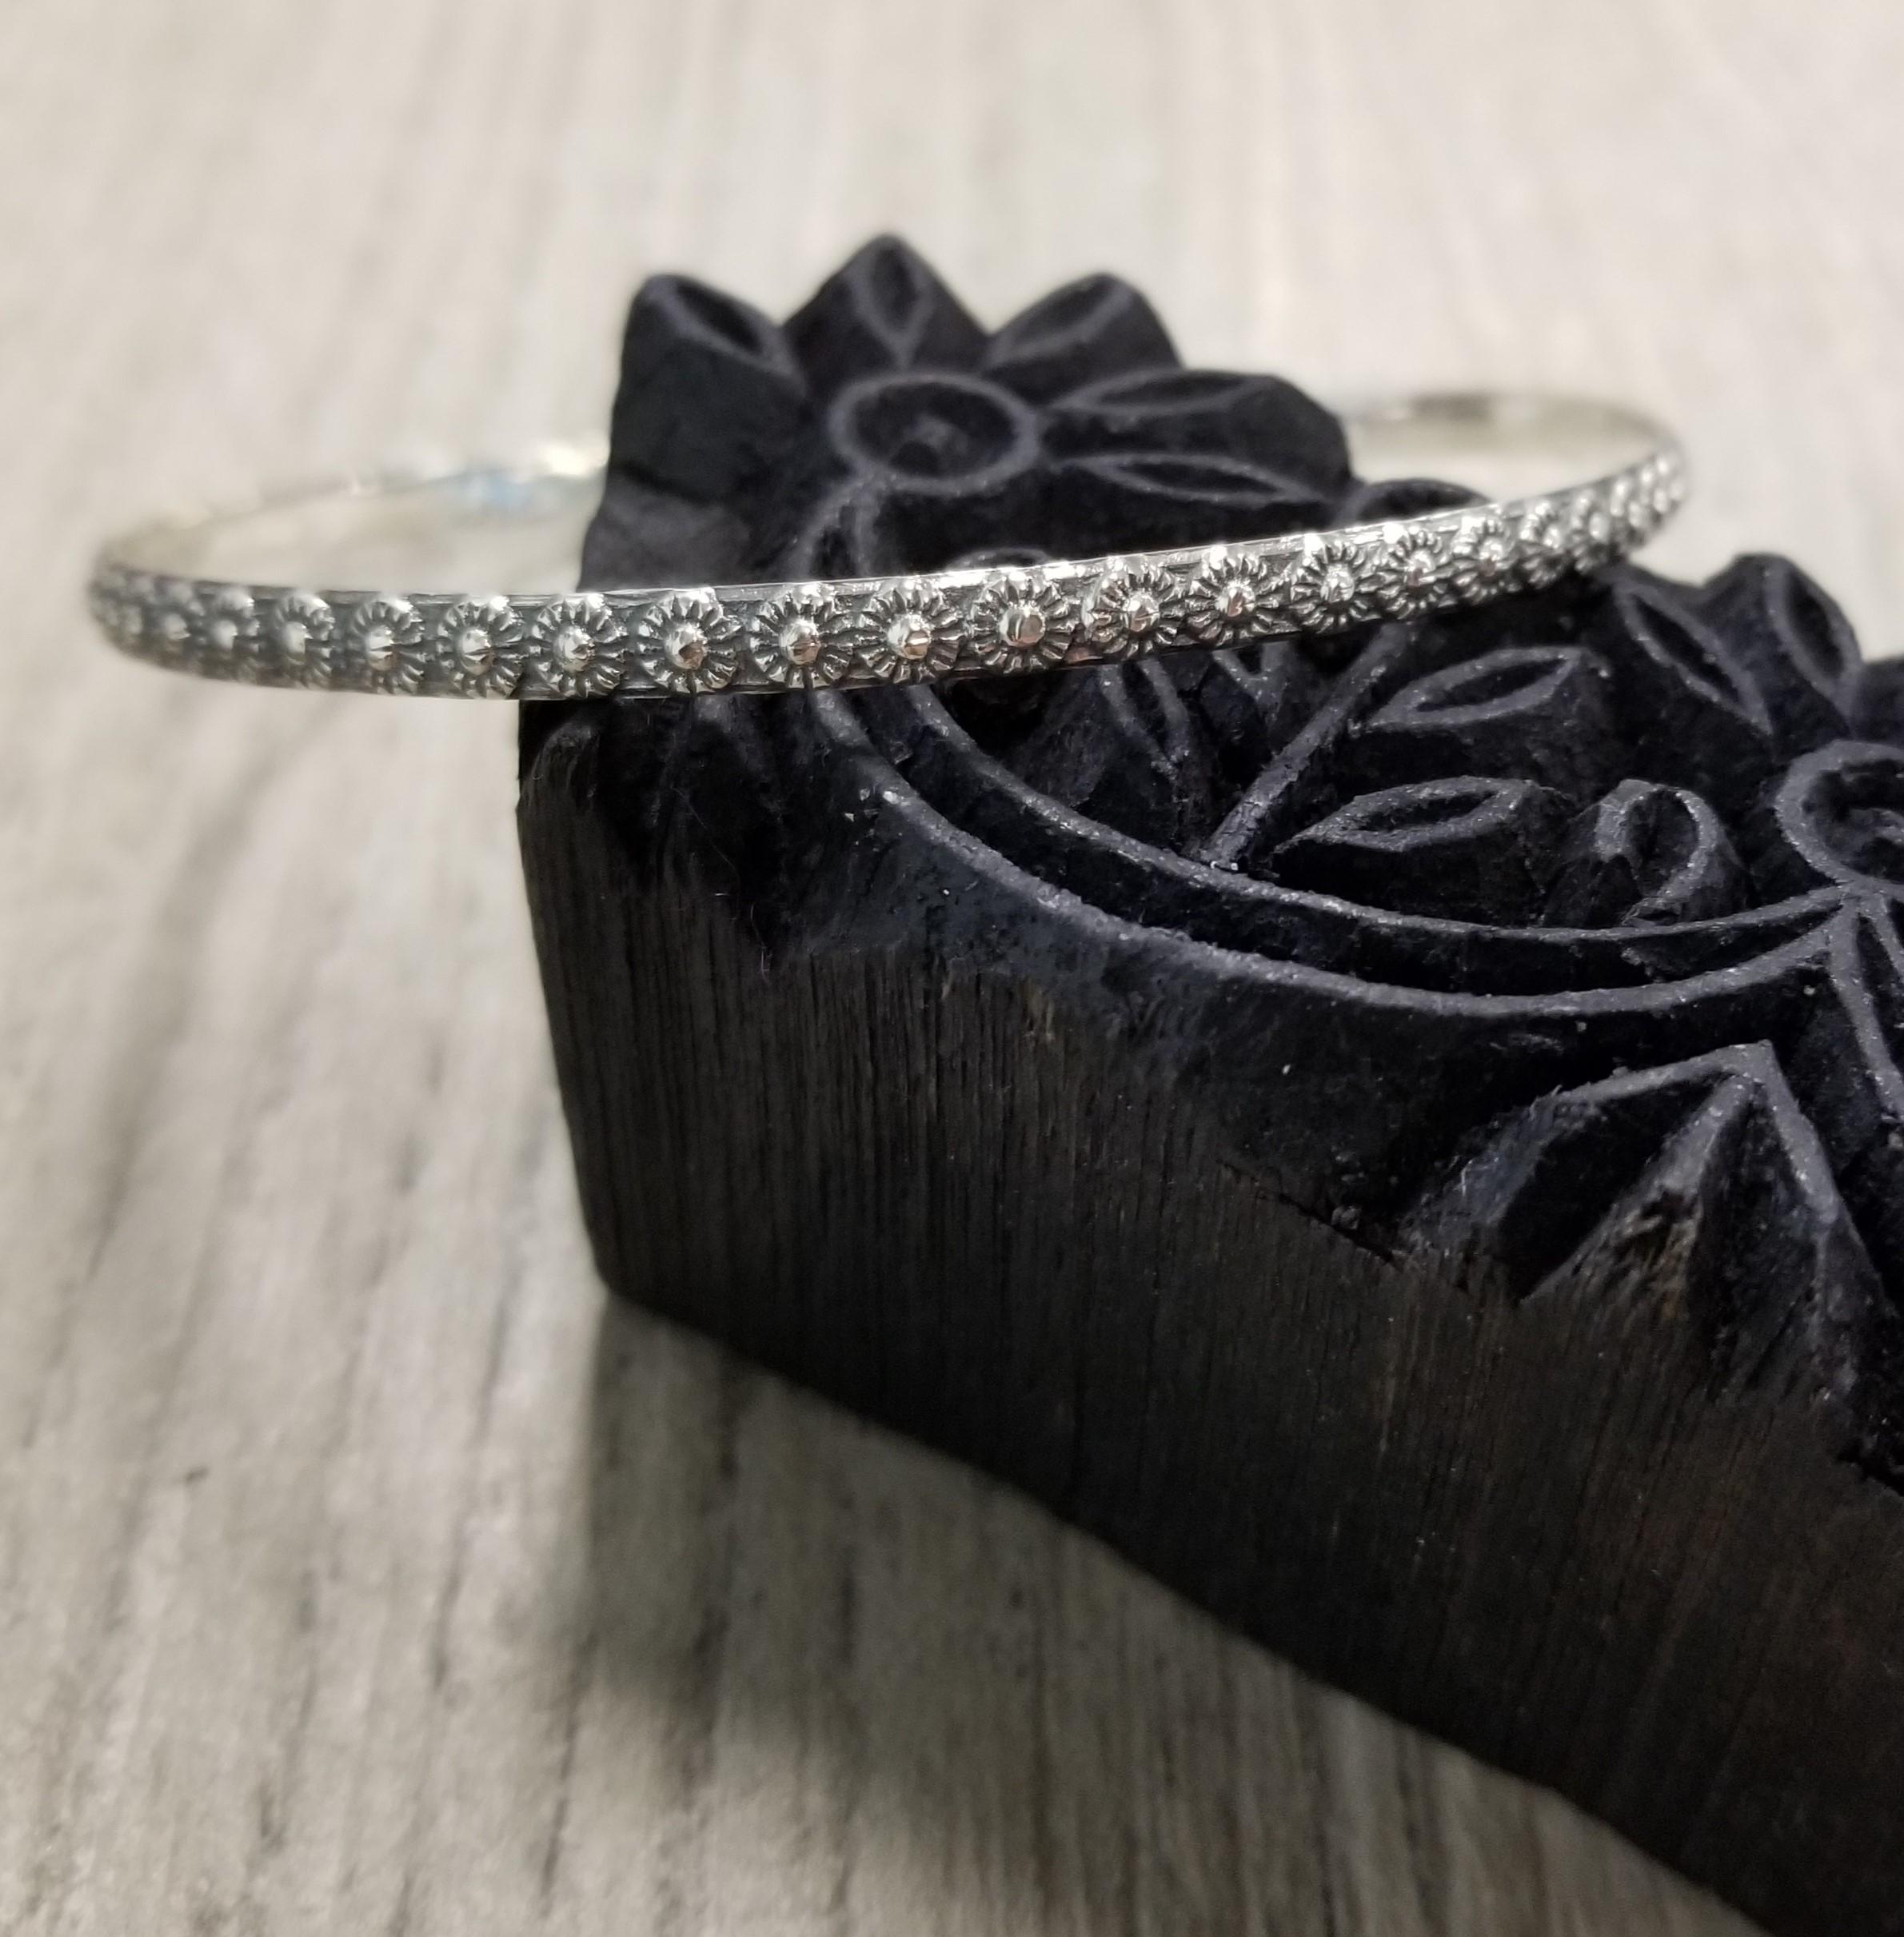 handmade sterling silver bangle bracelet with daisy design